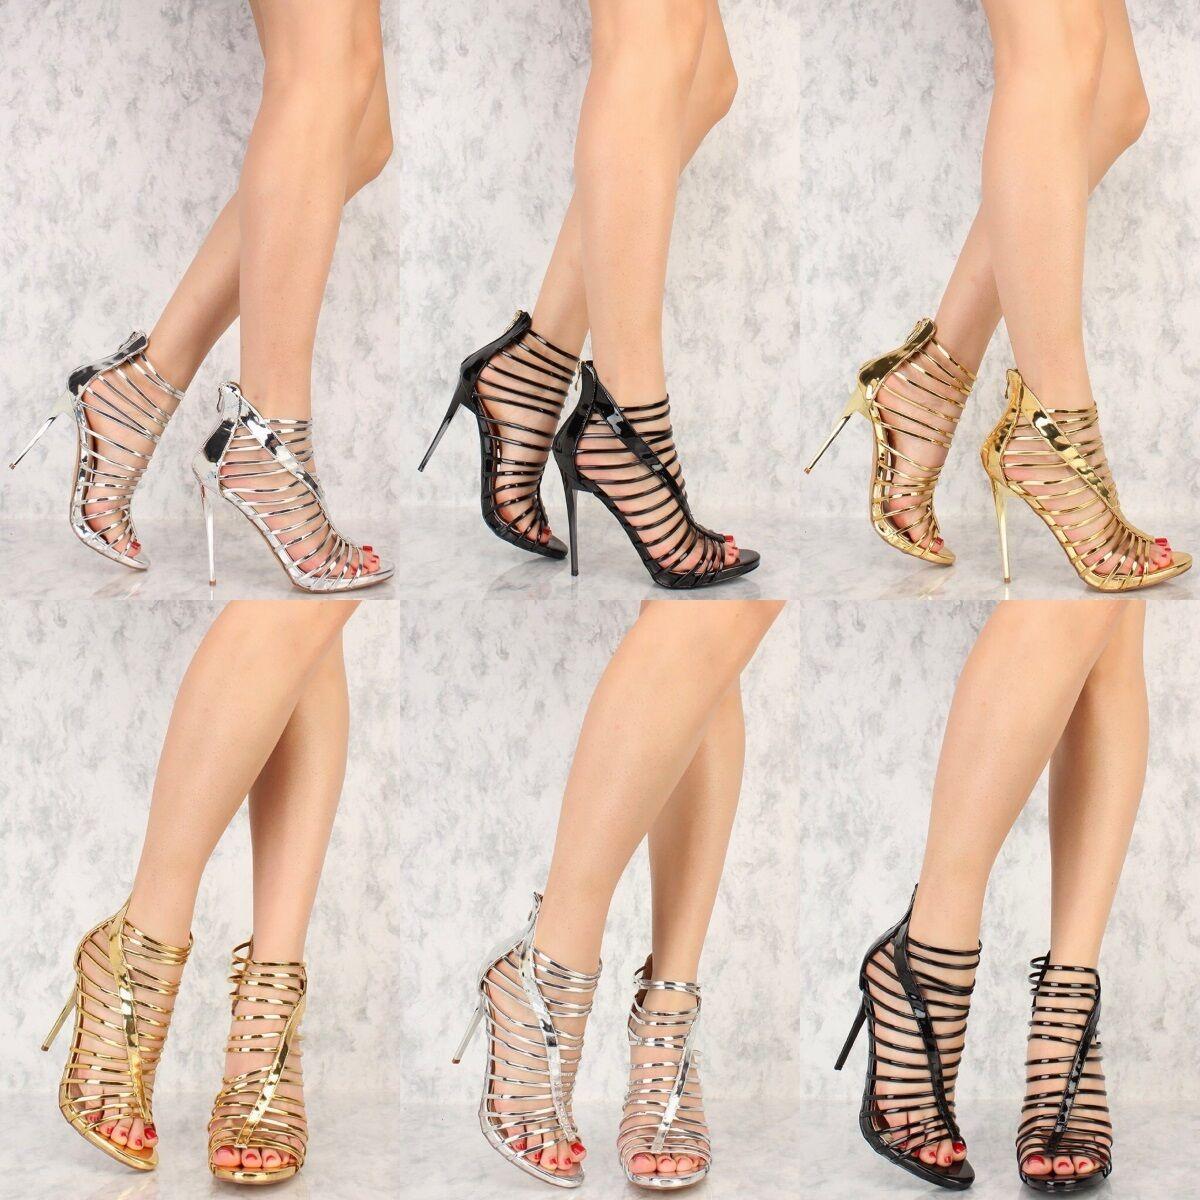 Metallic Patent Mirror Strappy Stiletto High Heels Open Toe Booties Sandals H182